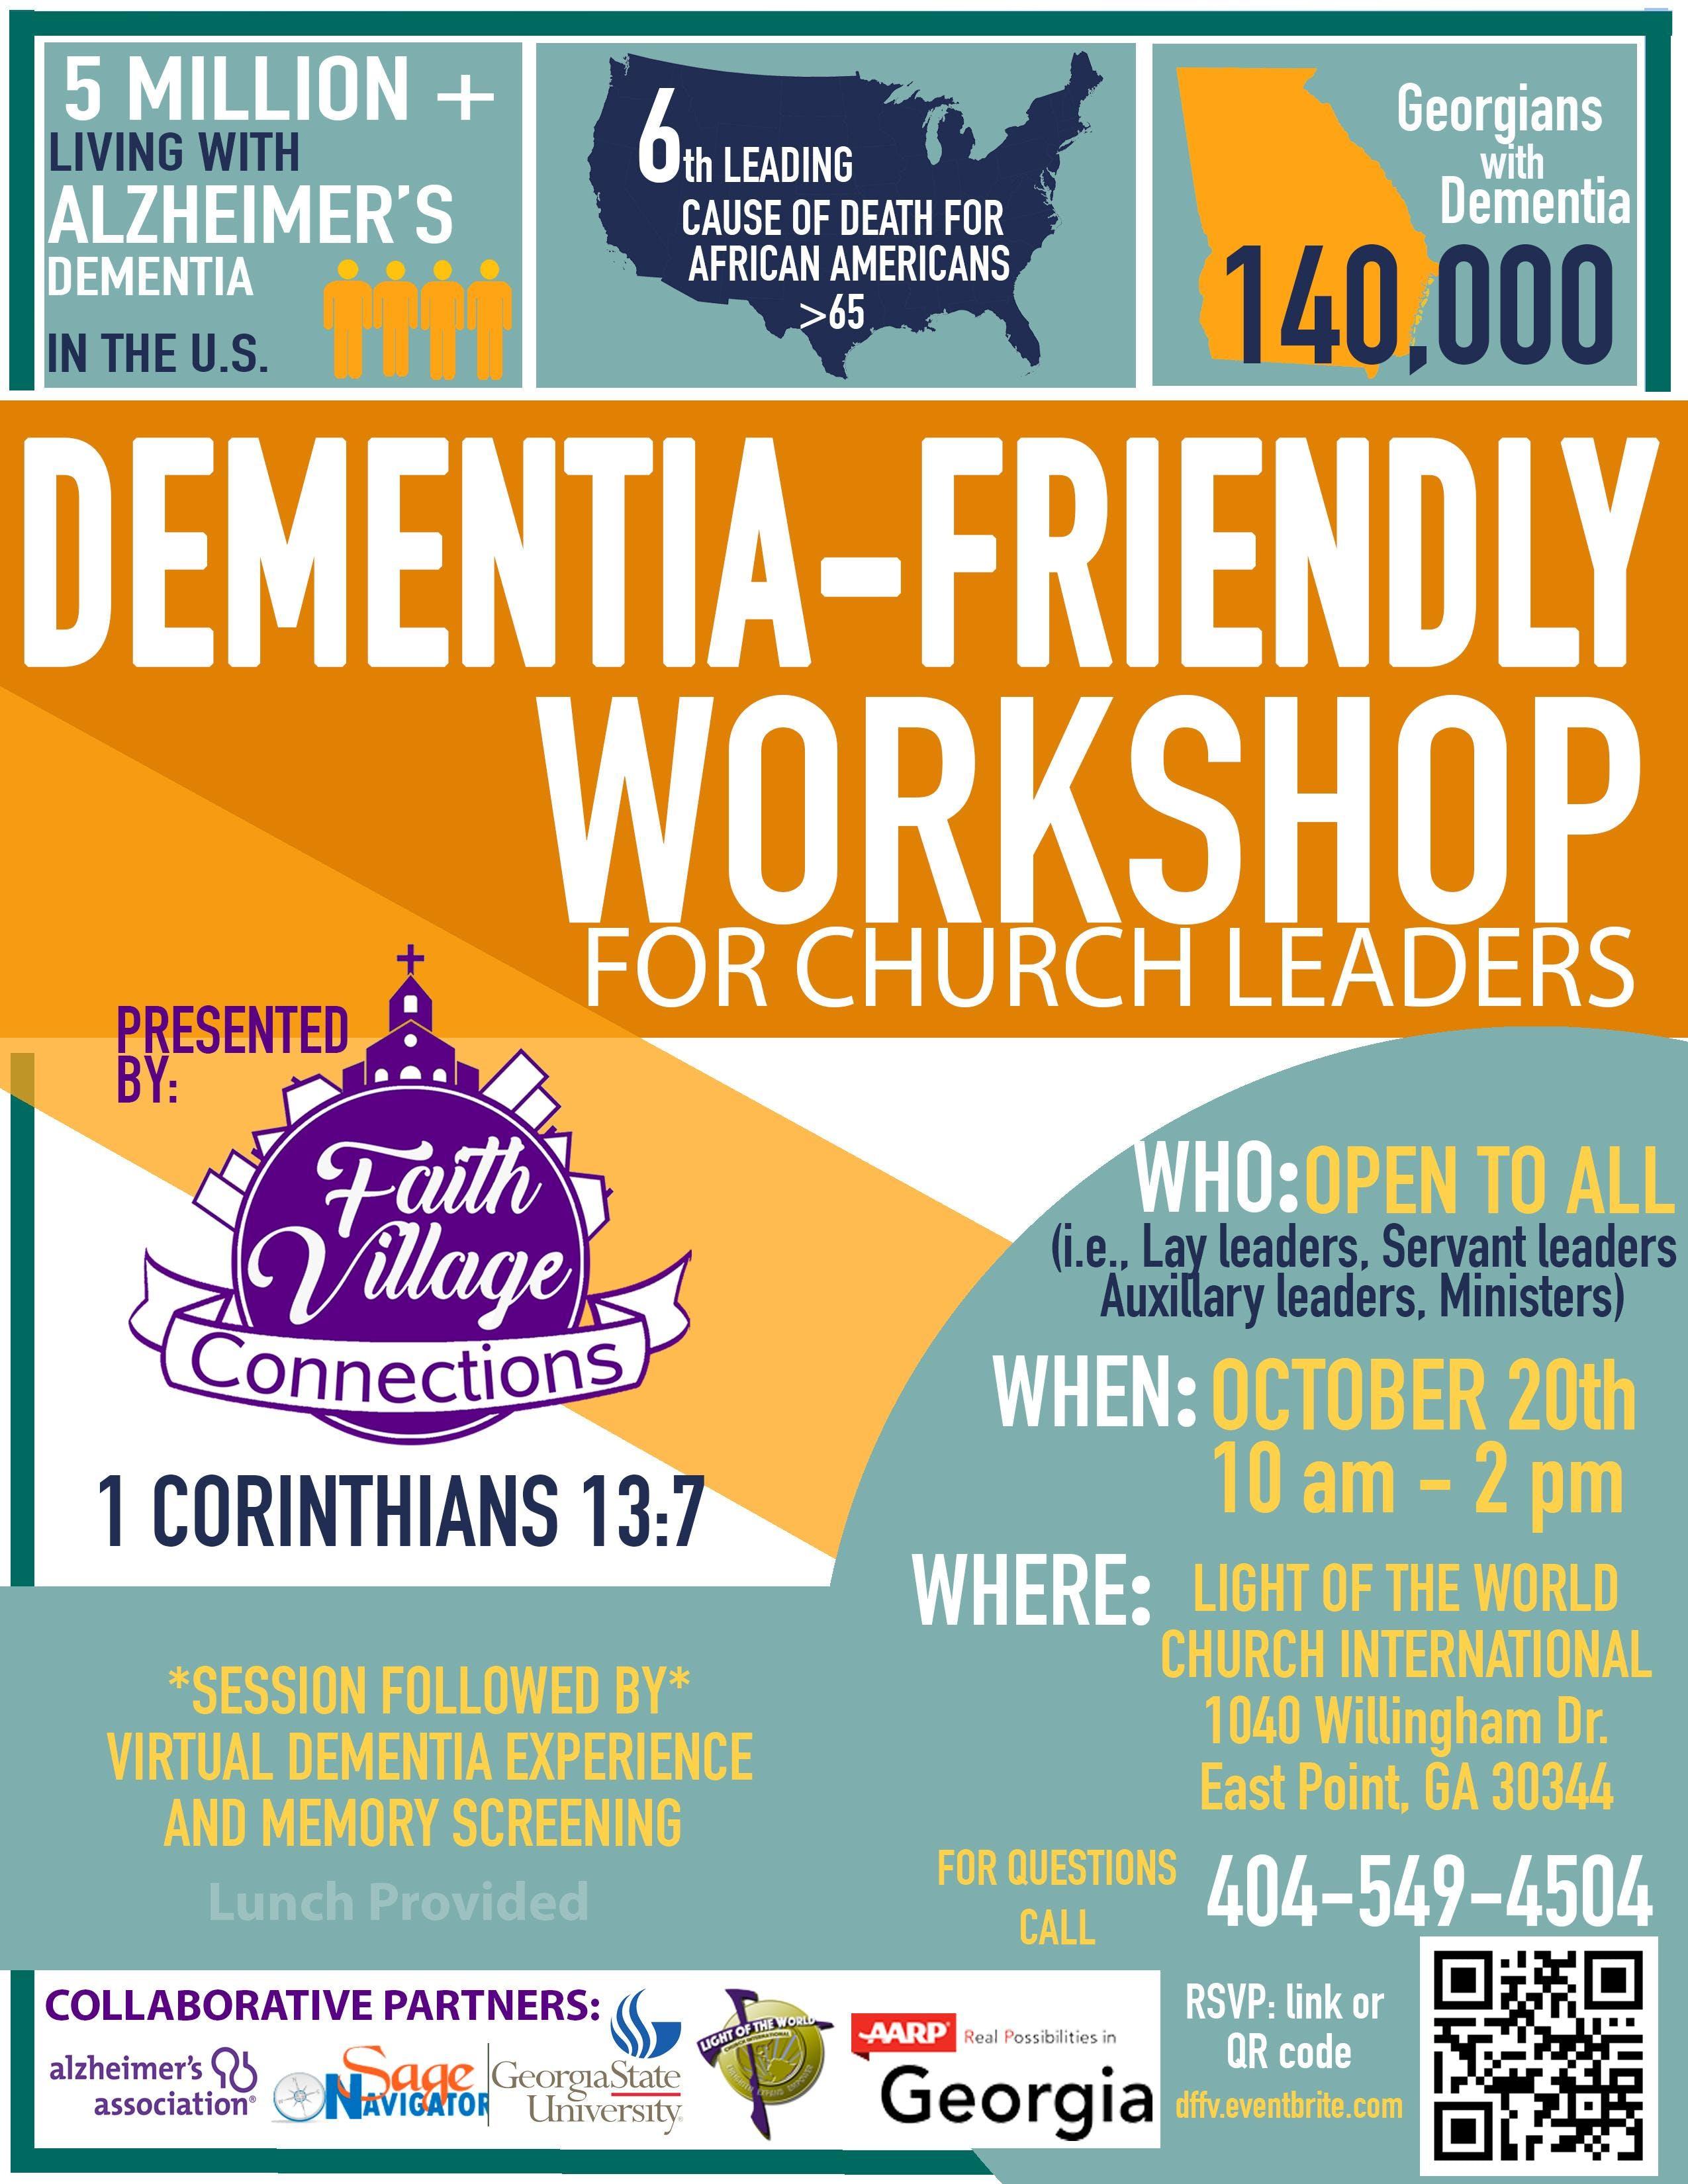 Dementia-Friendly Workshop for Church Leaders